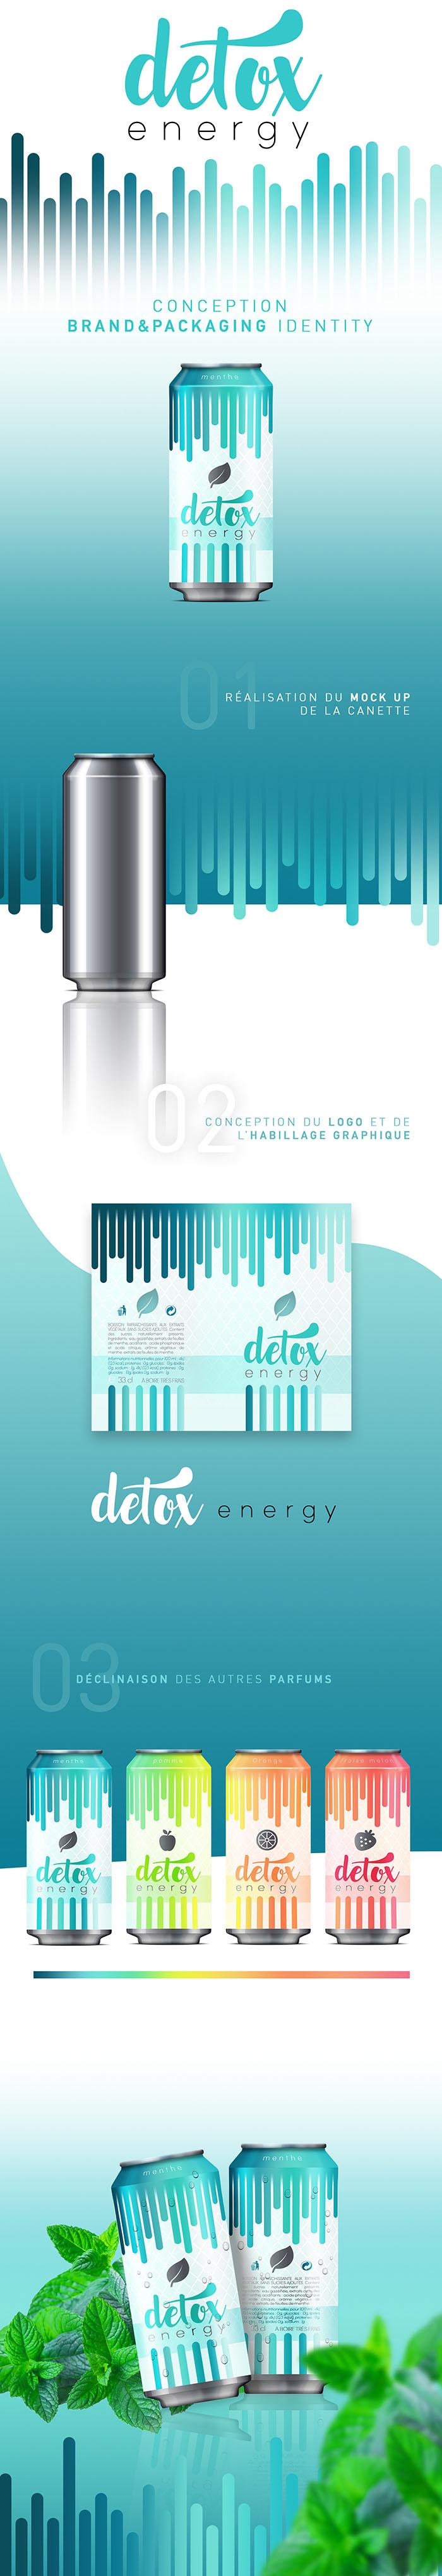 Detox Energy